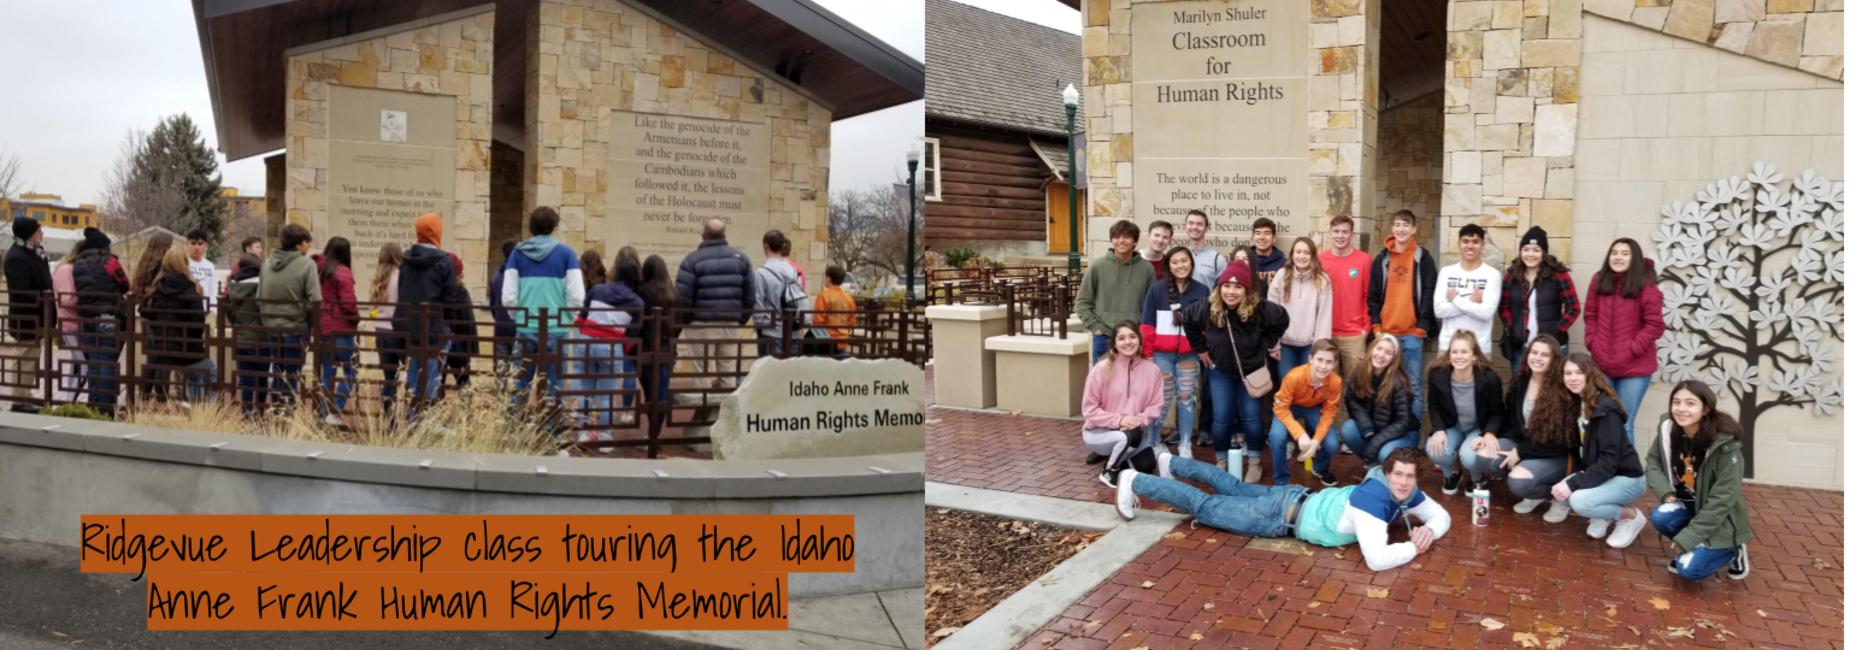 Ridgevue Leadership Class touring the Idaho Anne Frank Human Rights Memorial